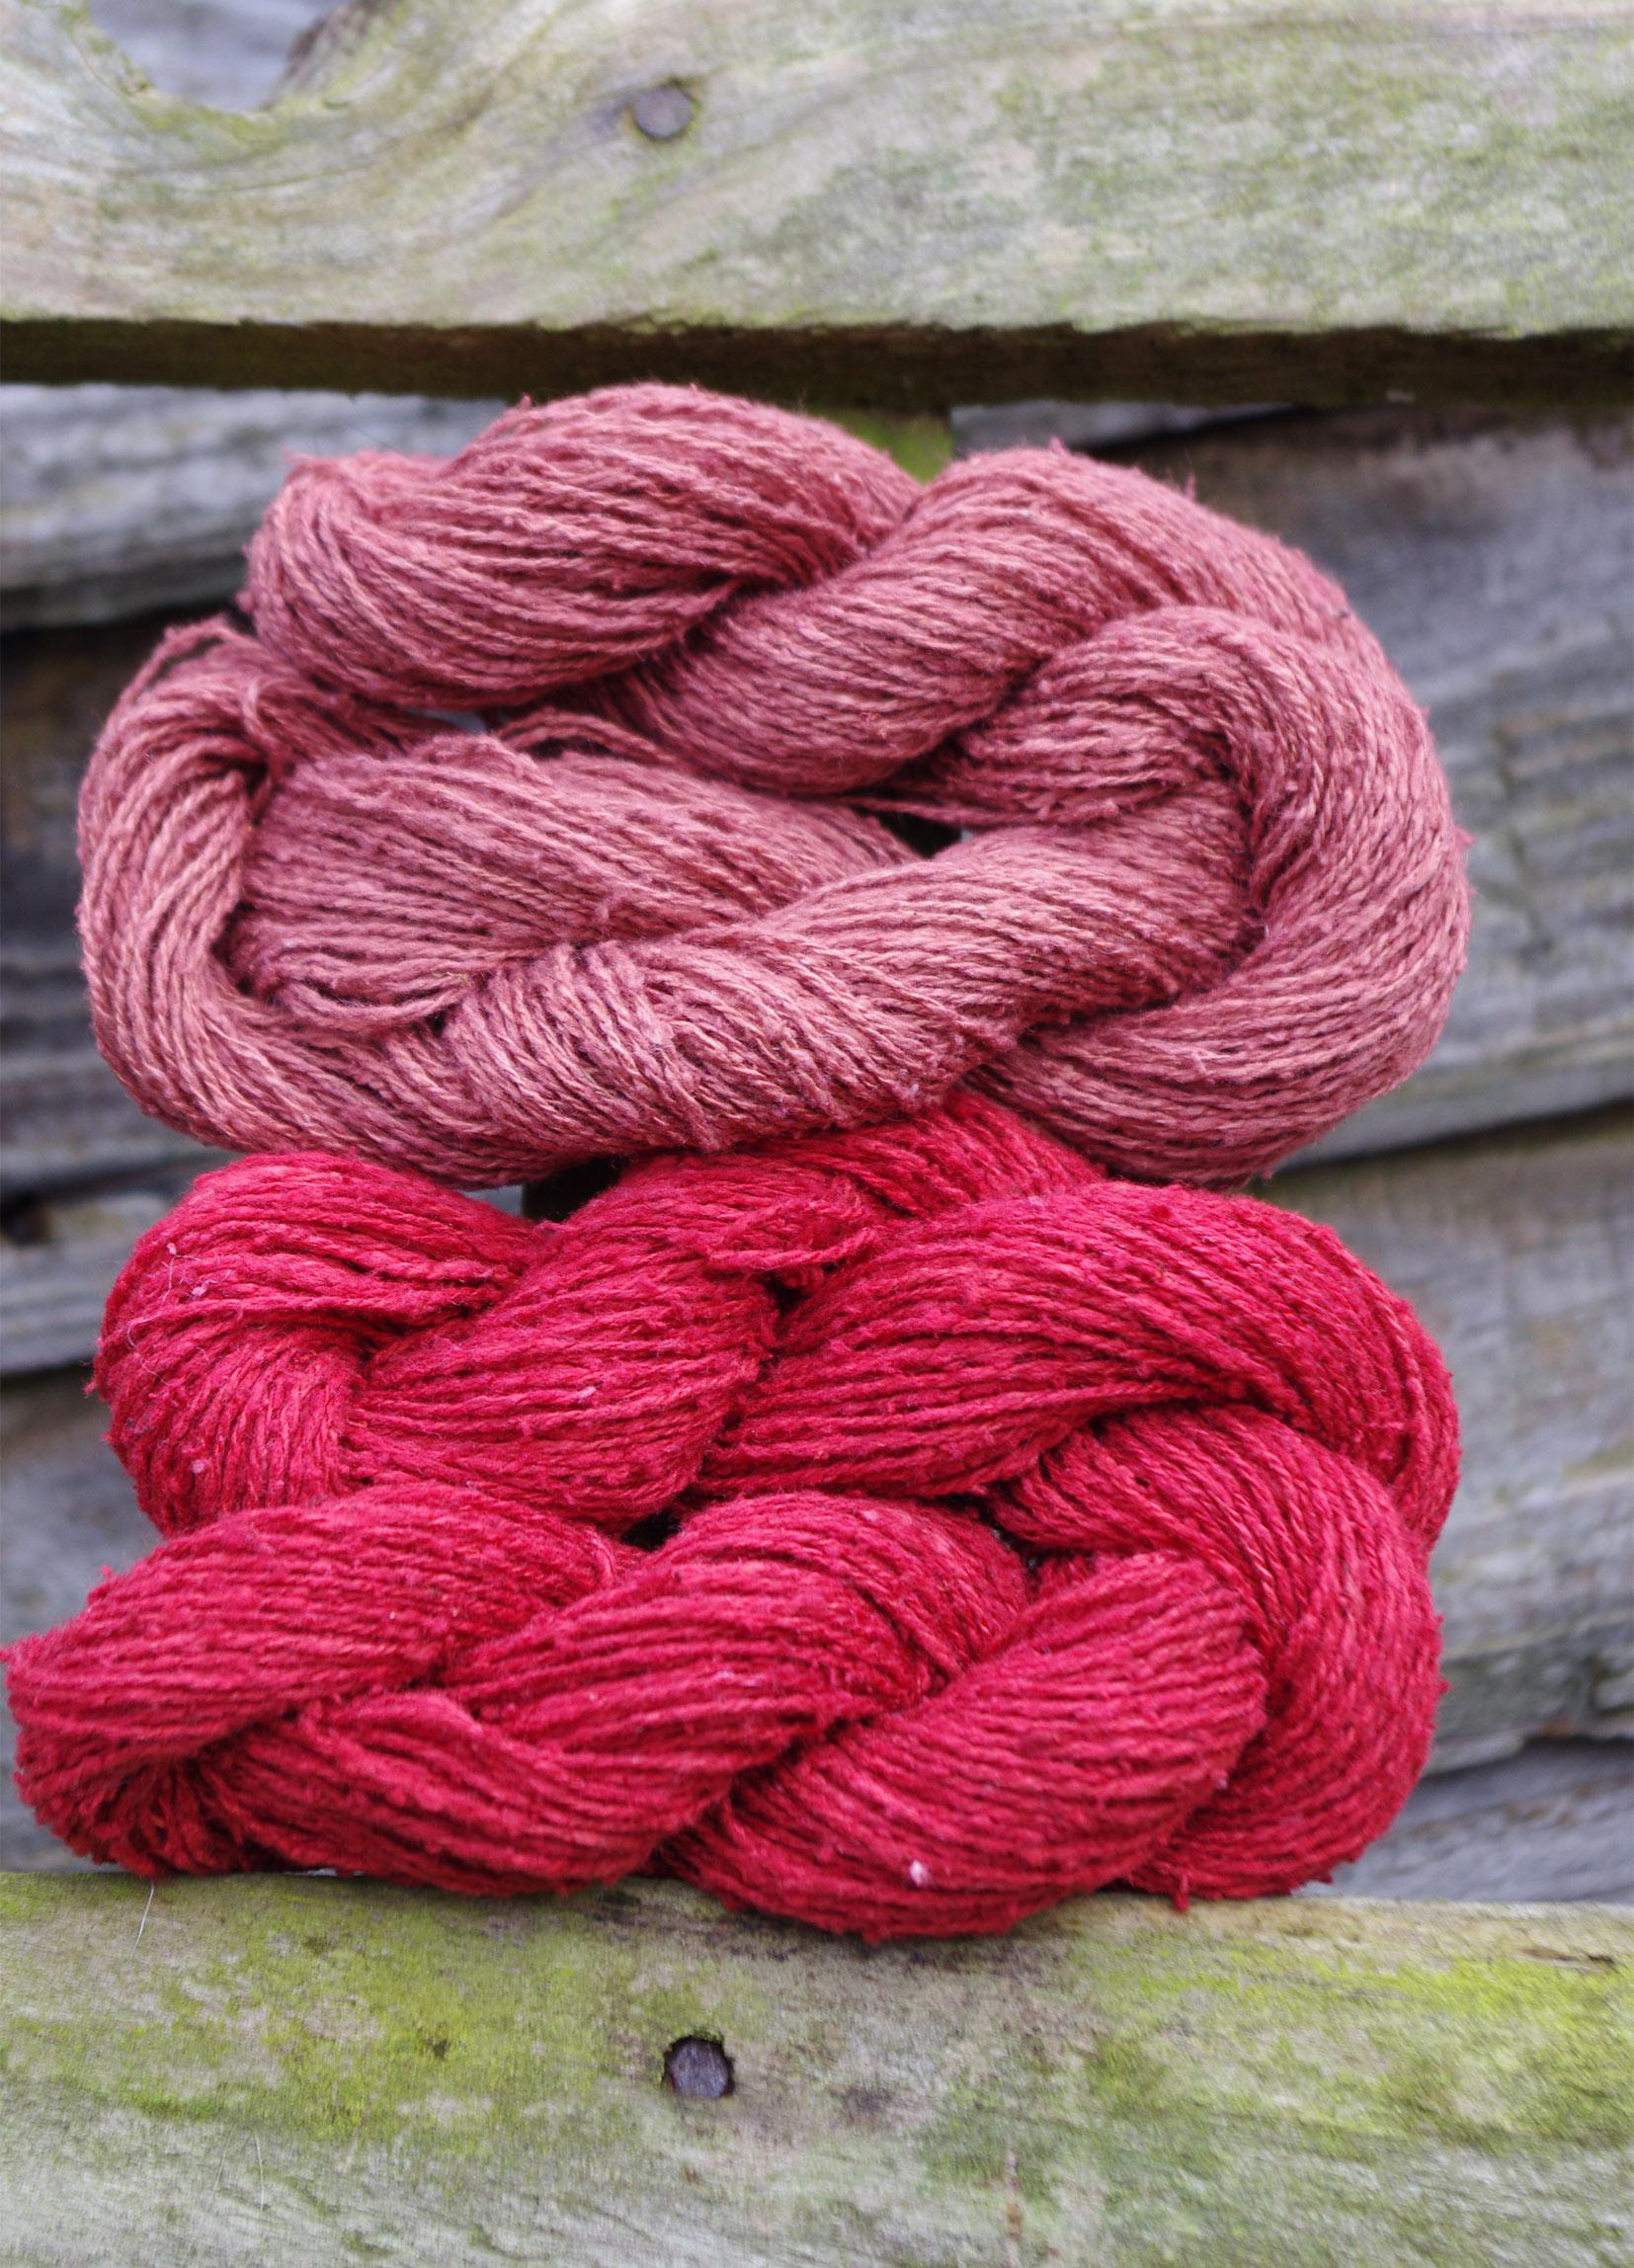 Two madder dyed silk skeins